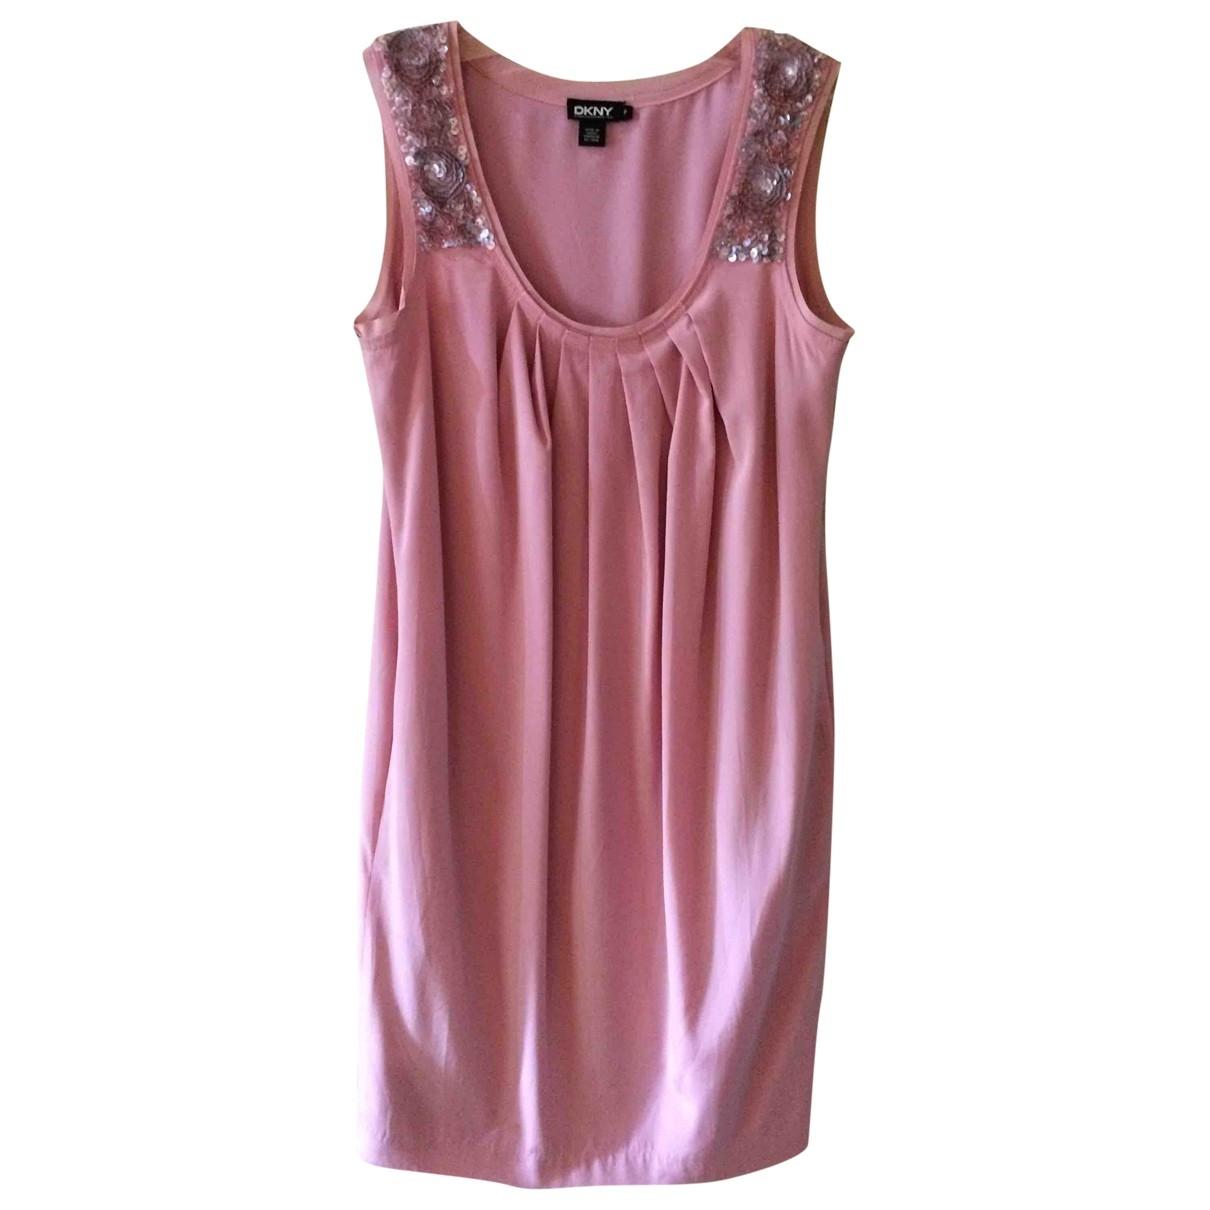 Dkny \N Pink Silk dress for Women S International